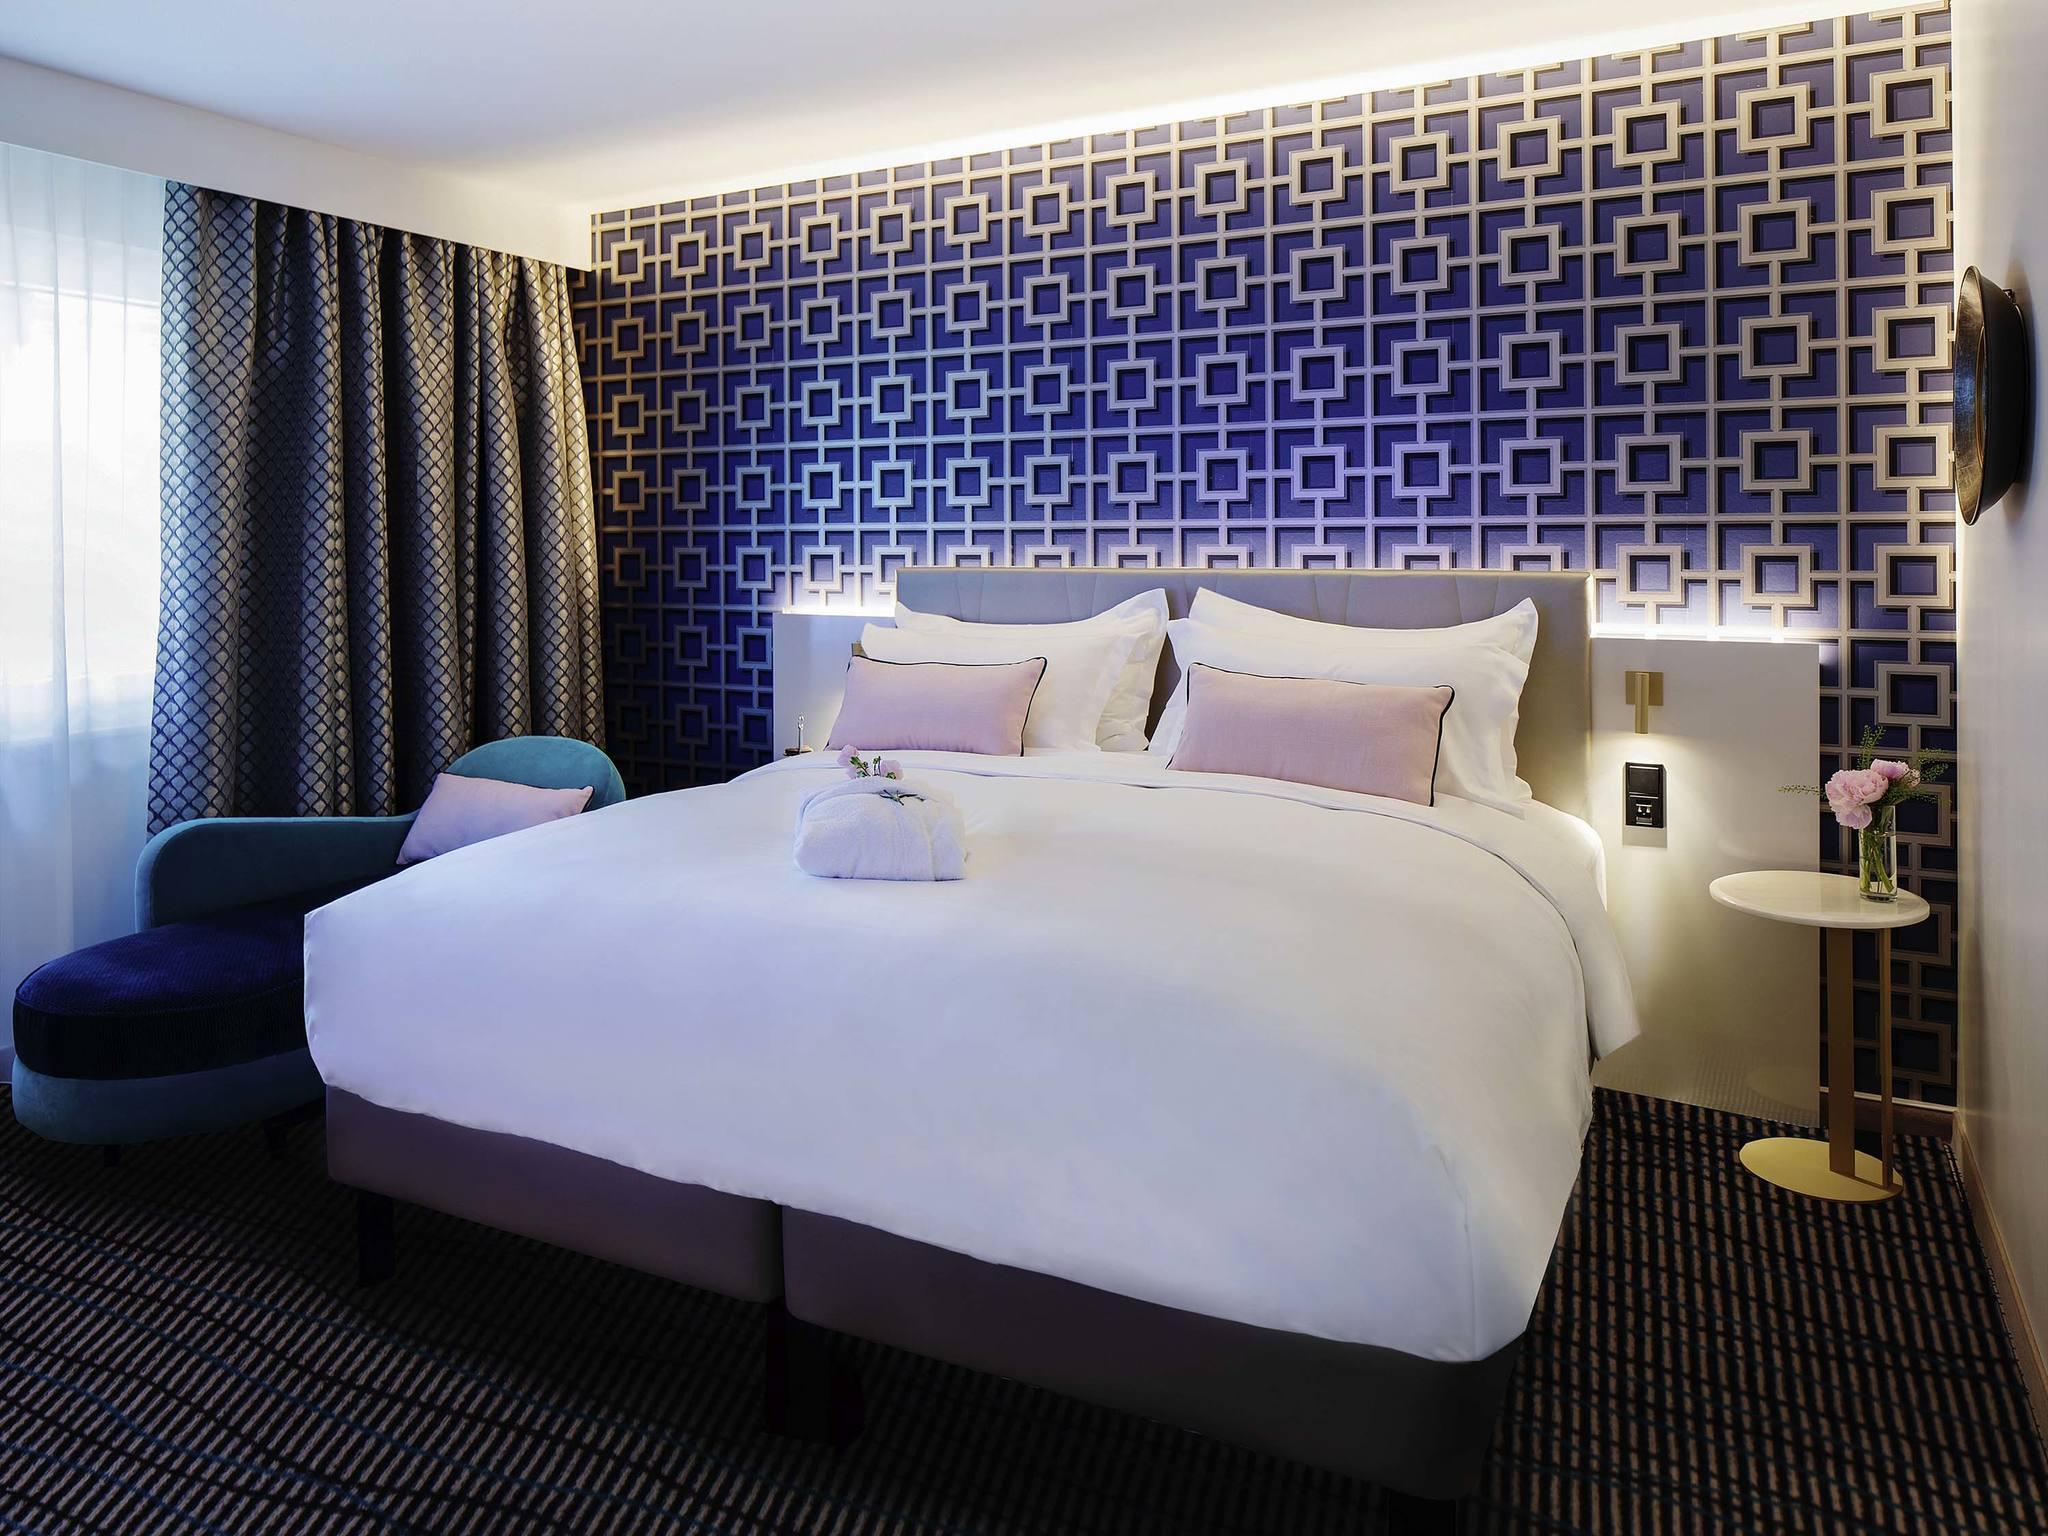 4 Sterne Hotel Bregenz City Mercure Accorhotels